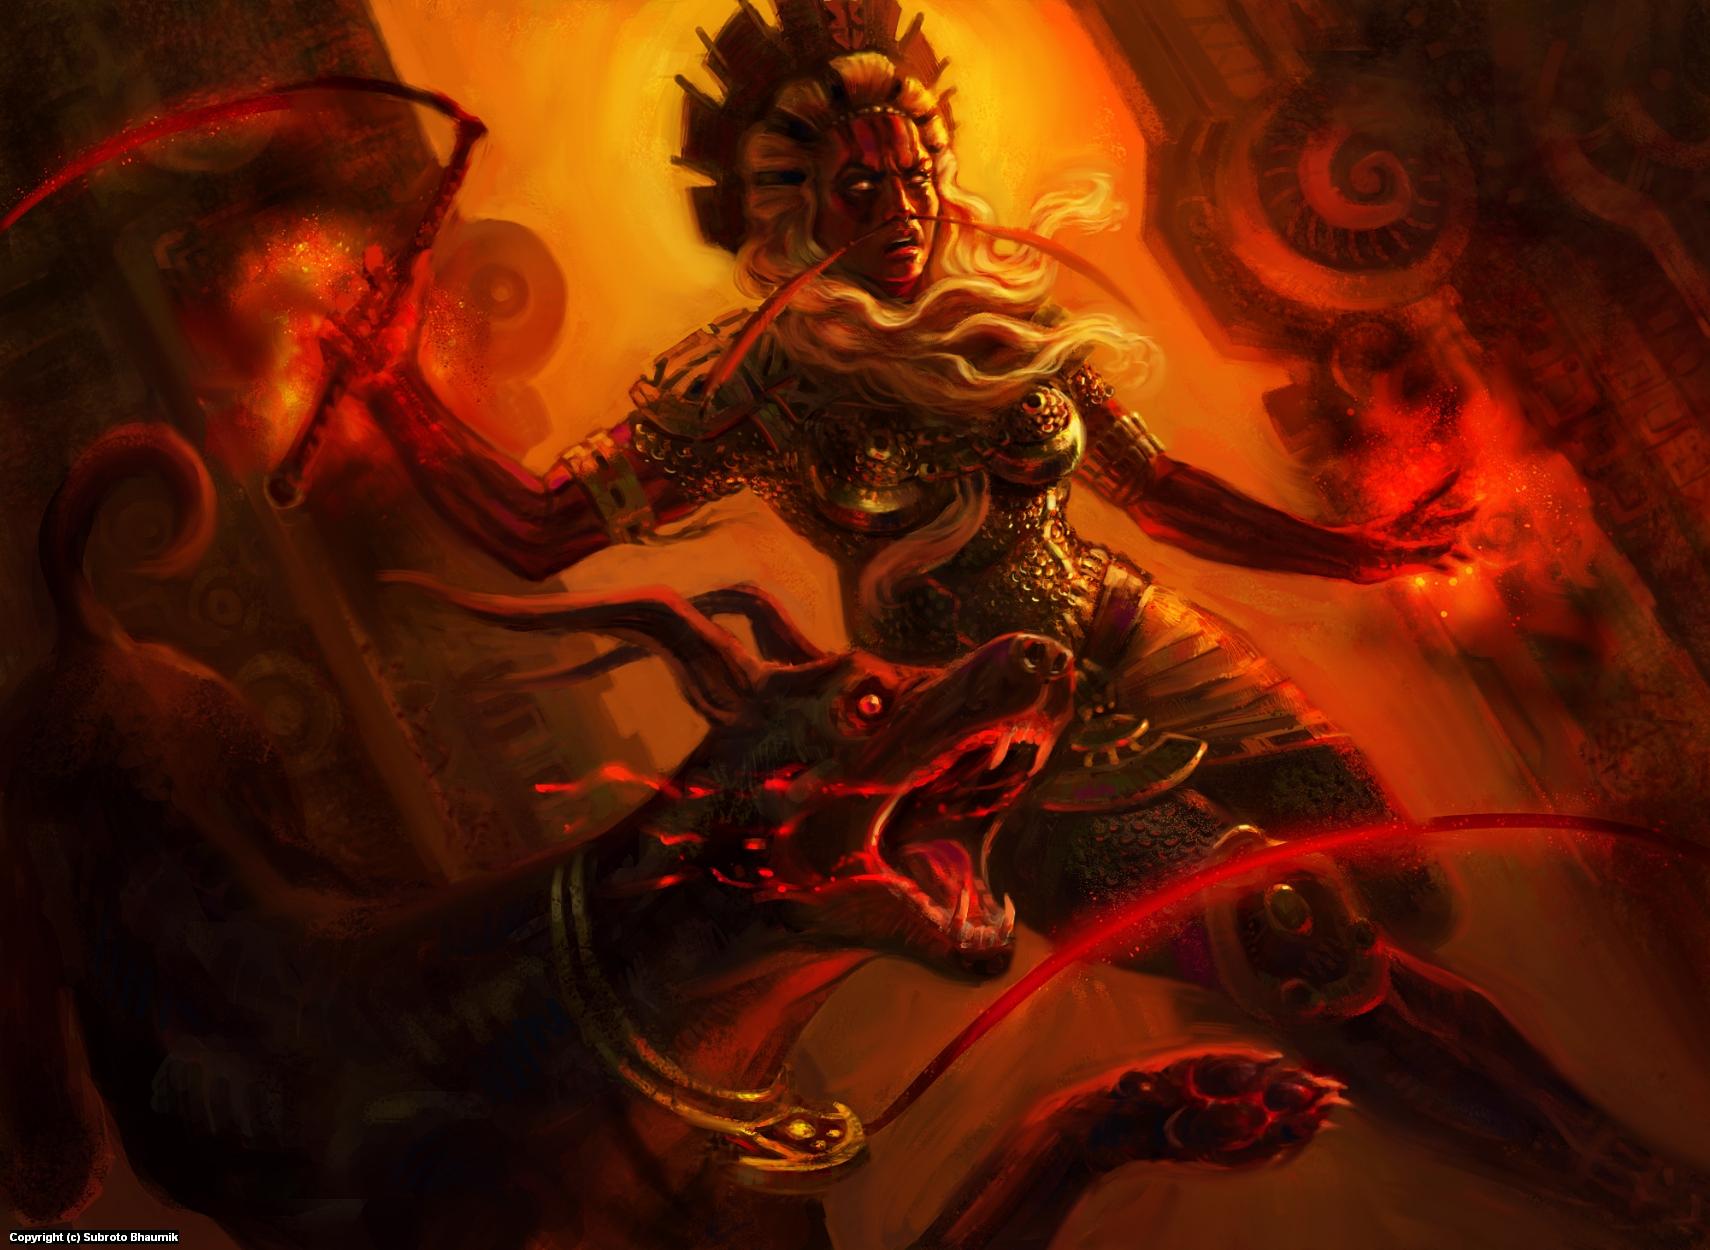 Pyro princess illustration Artwork by Subroto Bhaumik